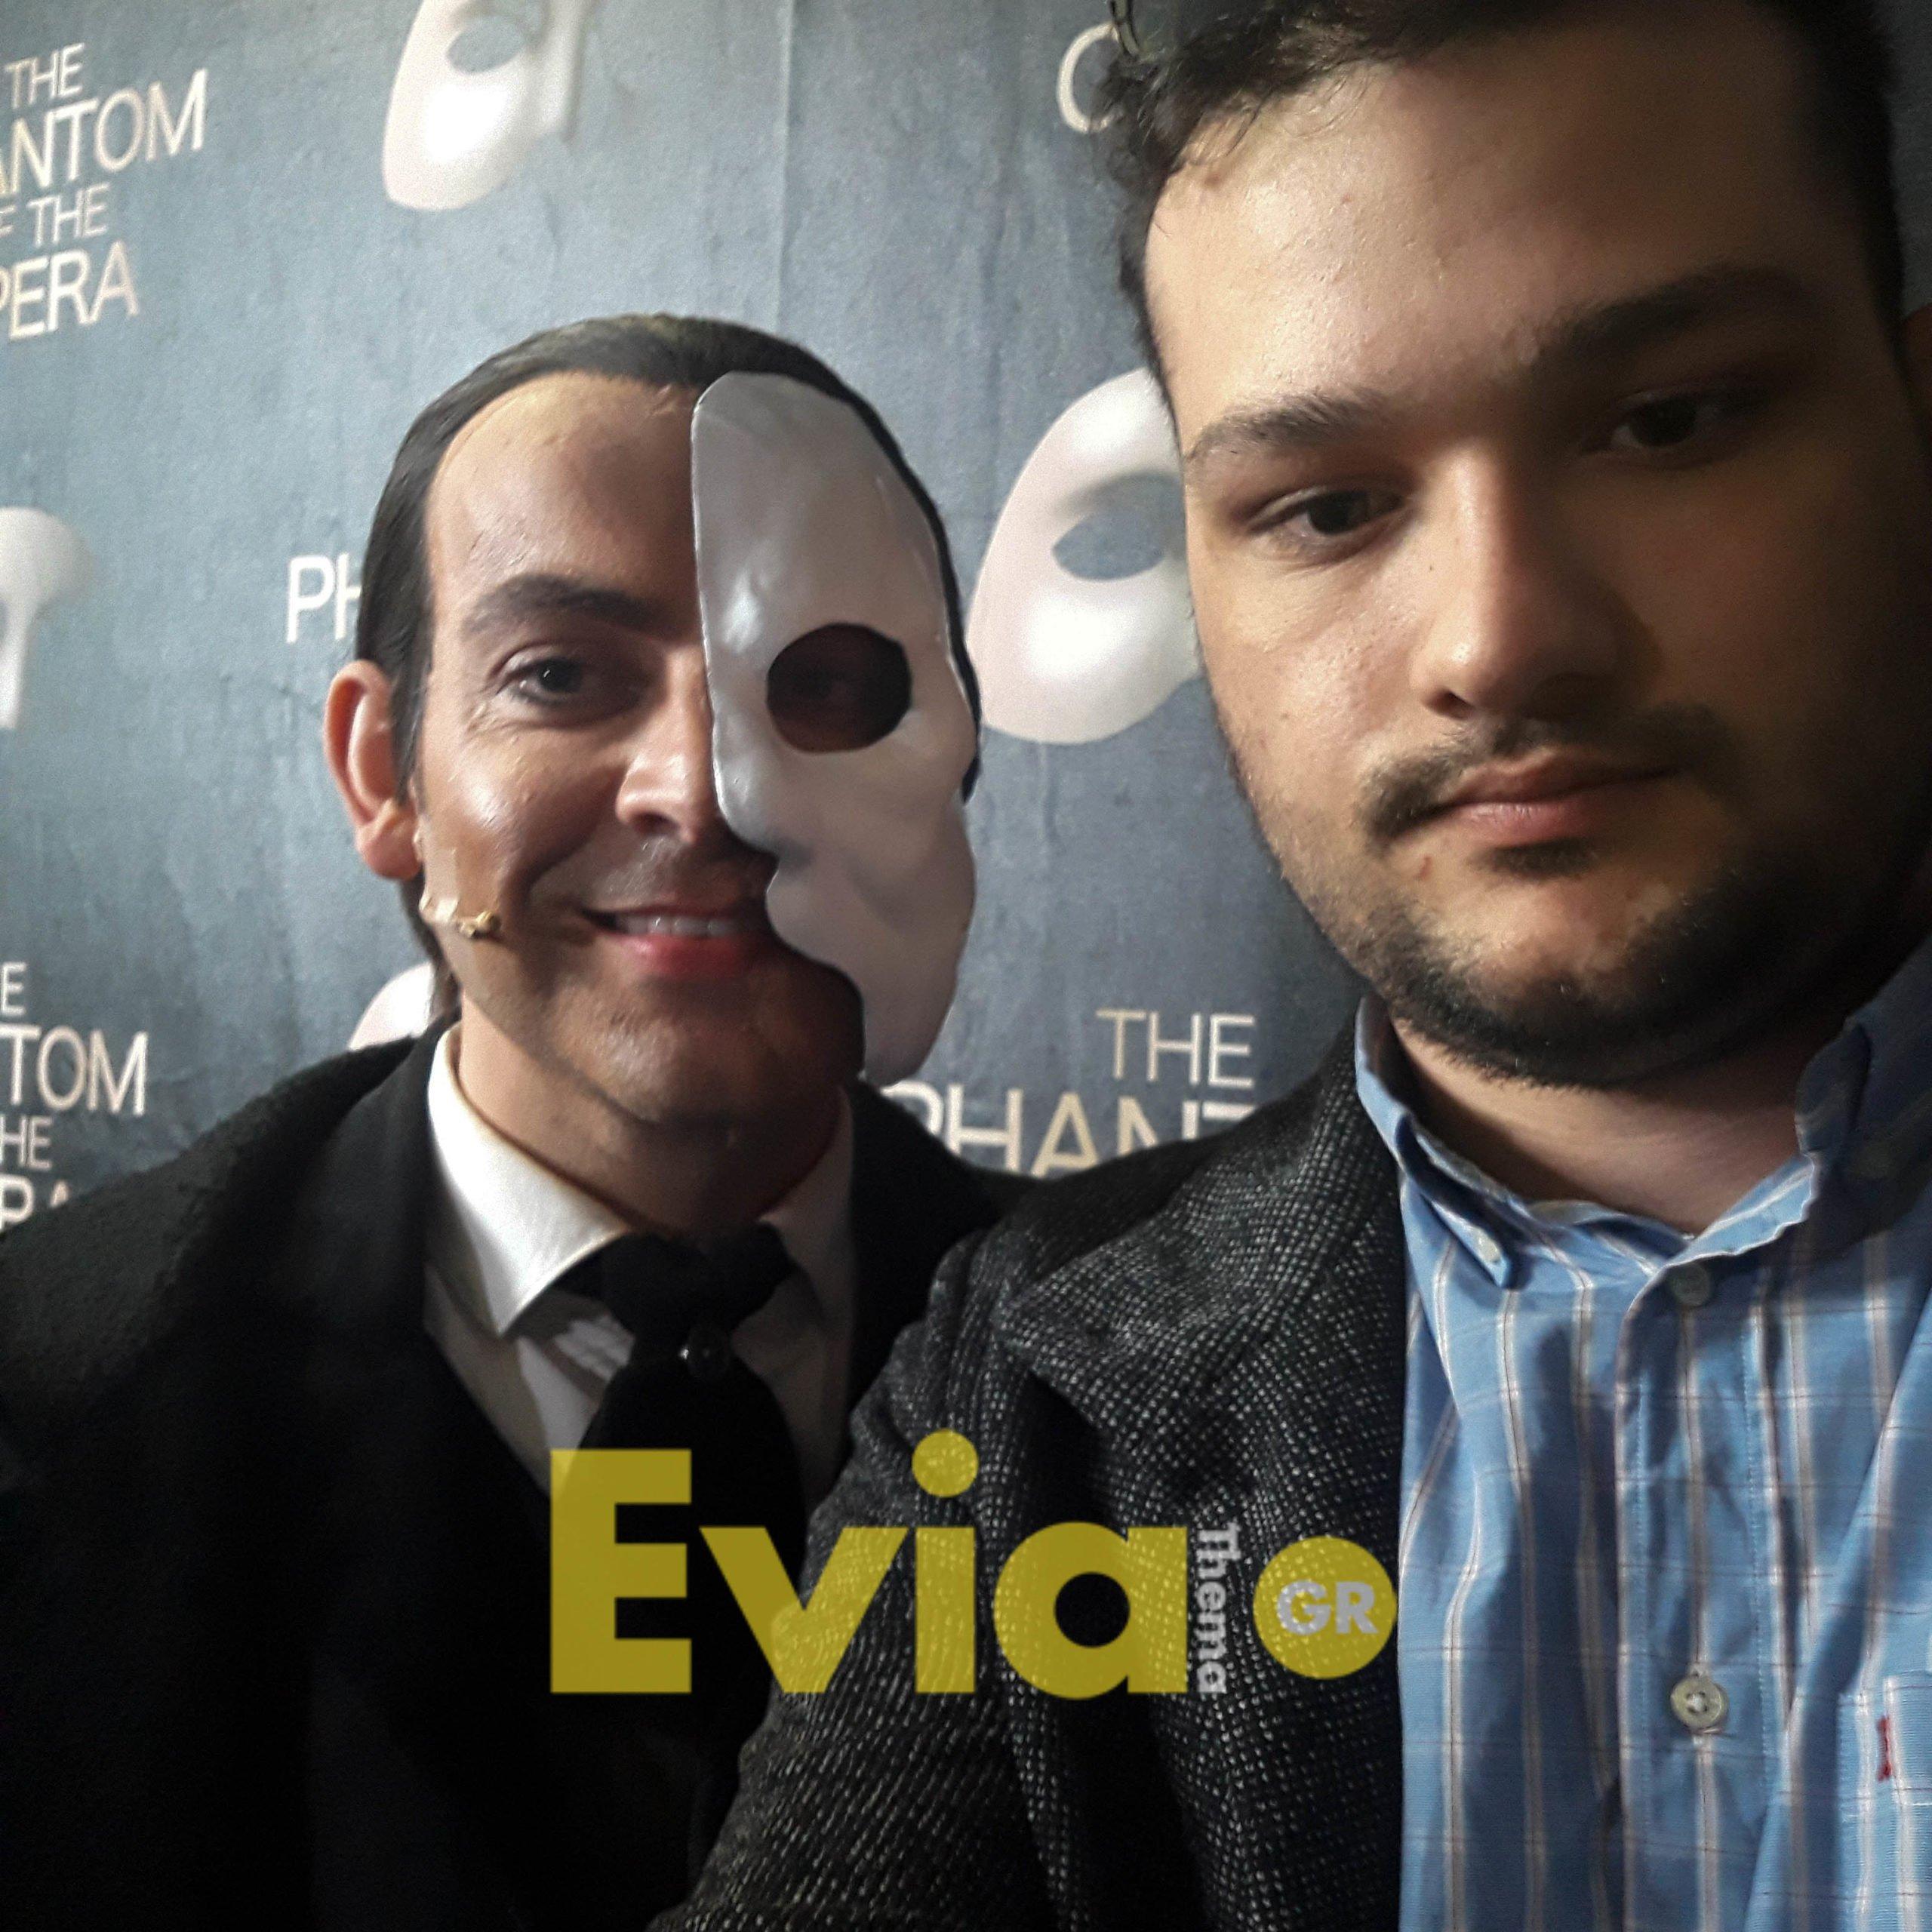 "phantom of the opera ""Phantom of the Opera"" στο Christmas Theater: Ένα εκθαμβωτικό musical (Δηλώσεις-Φωτογραφίες-Βίντεο) IMG 20200223 181539 946 scaled"